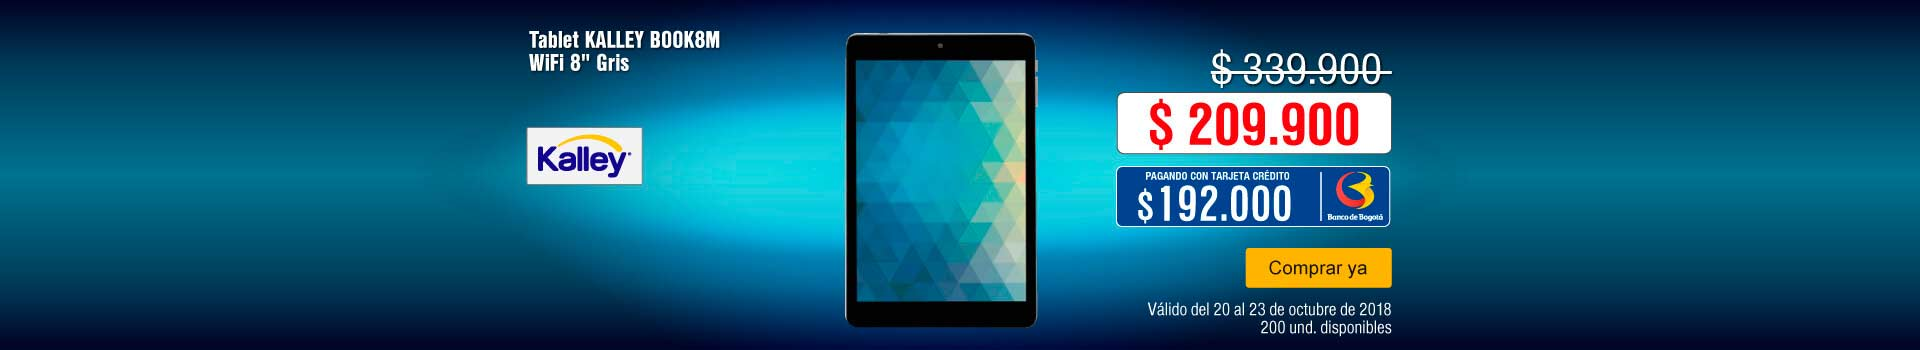 KT-HIPER-1-computadores y tablets-PP---Kalley-Tablet BOOK8M-Oct20